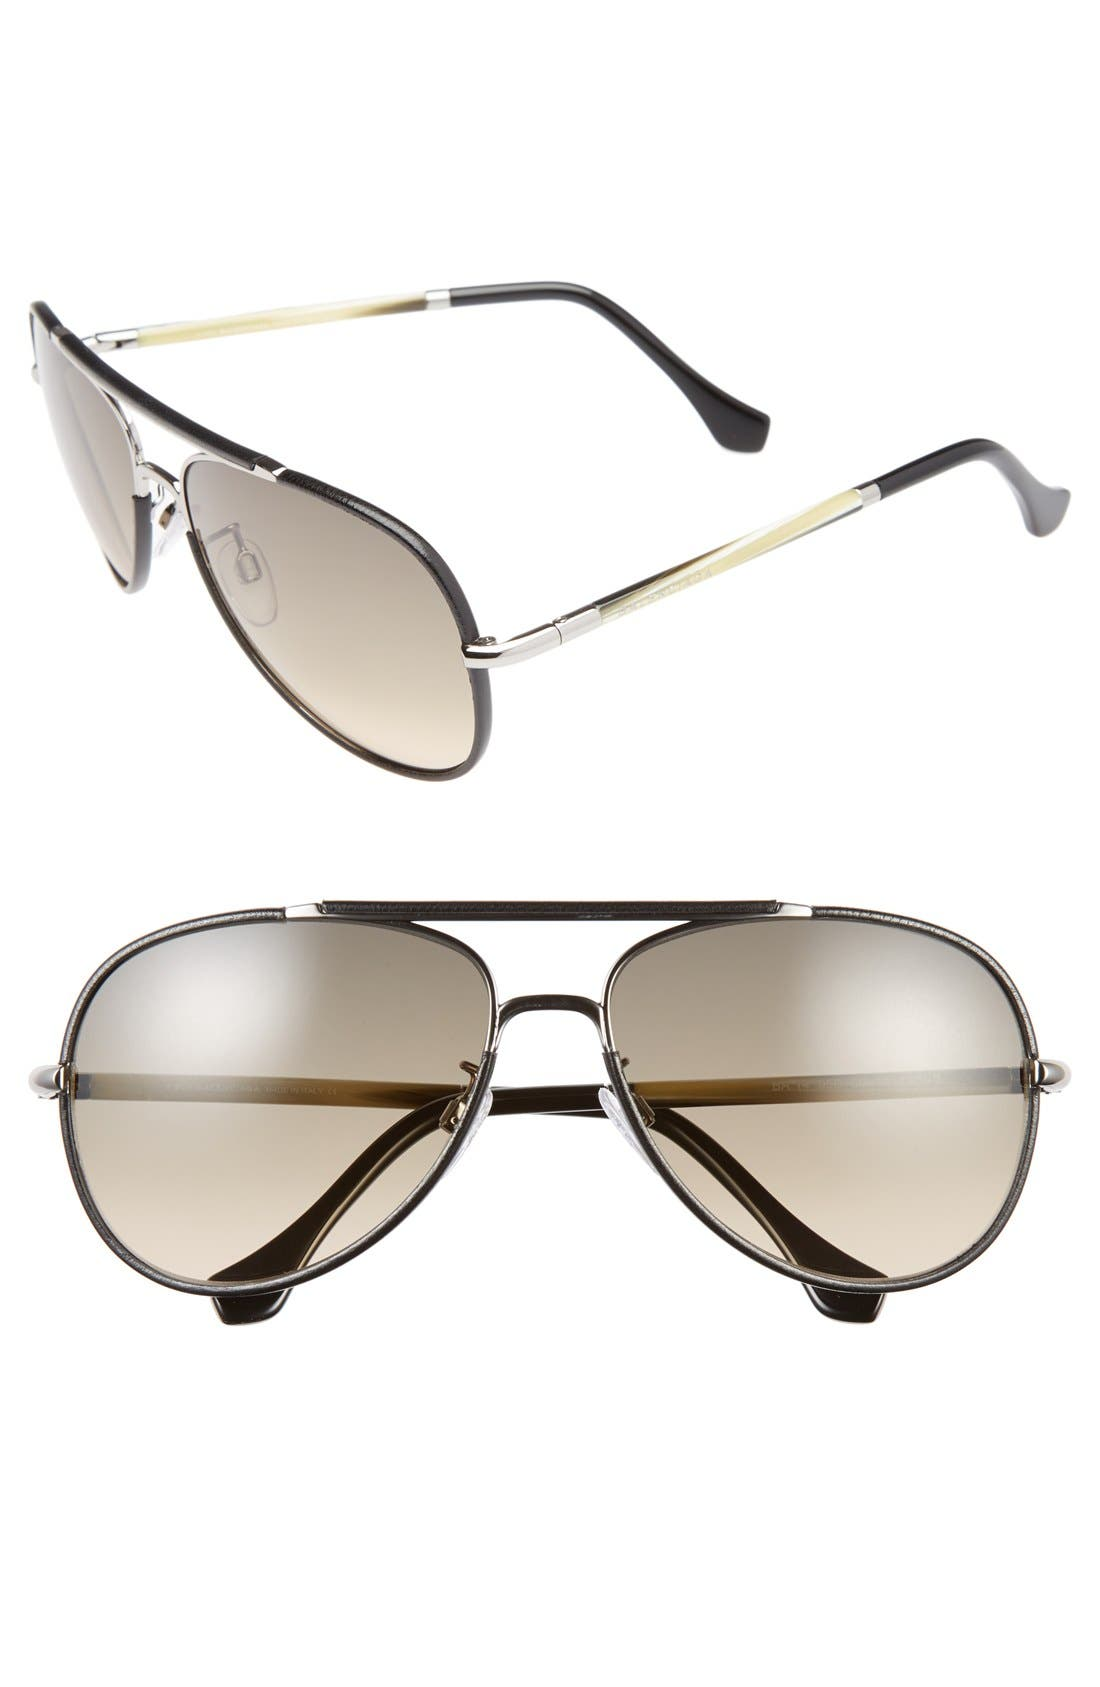 Main Image - Balenciaga Paris 60mm Sunglasses